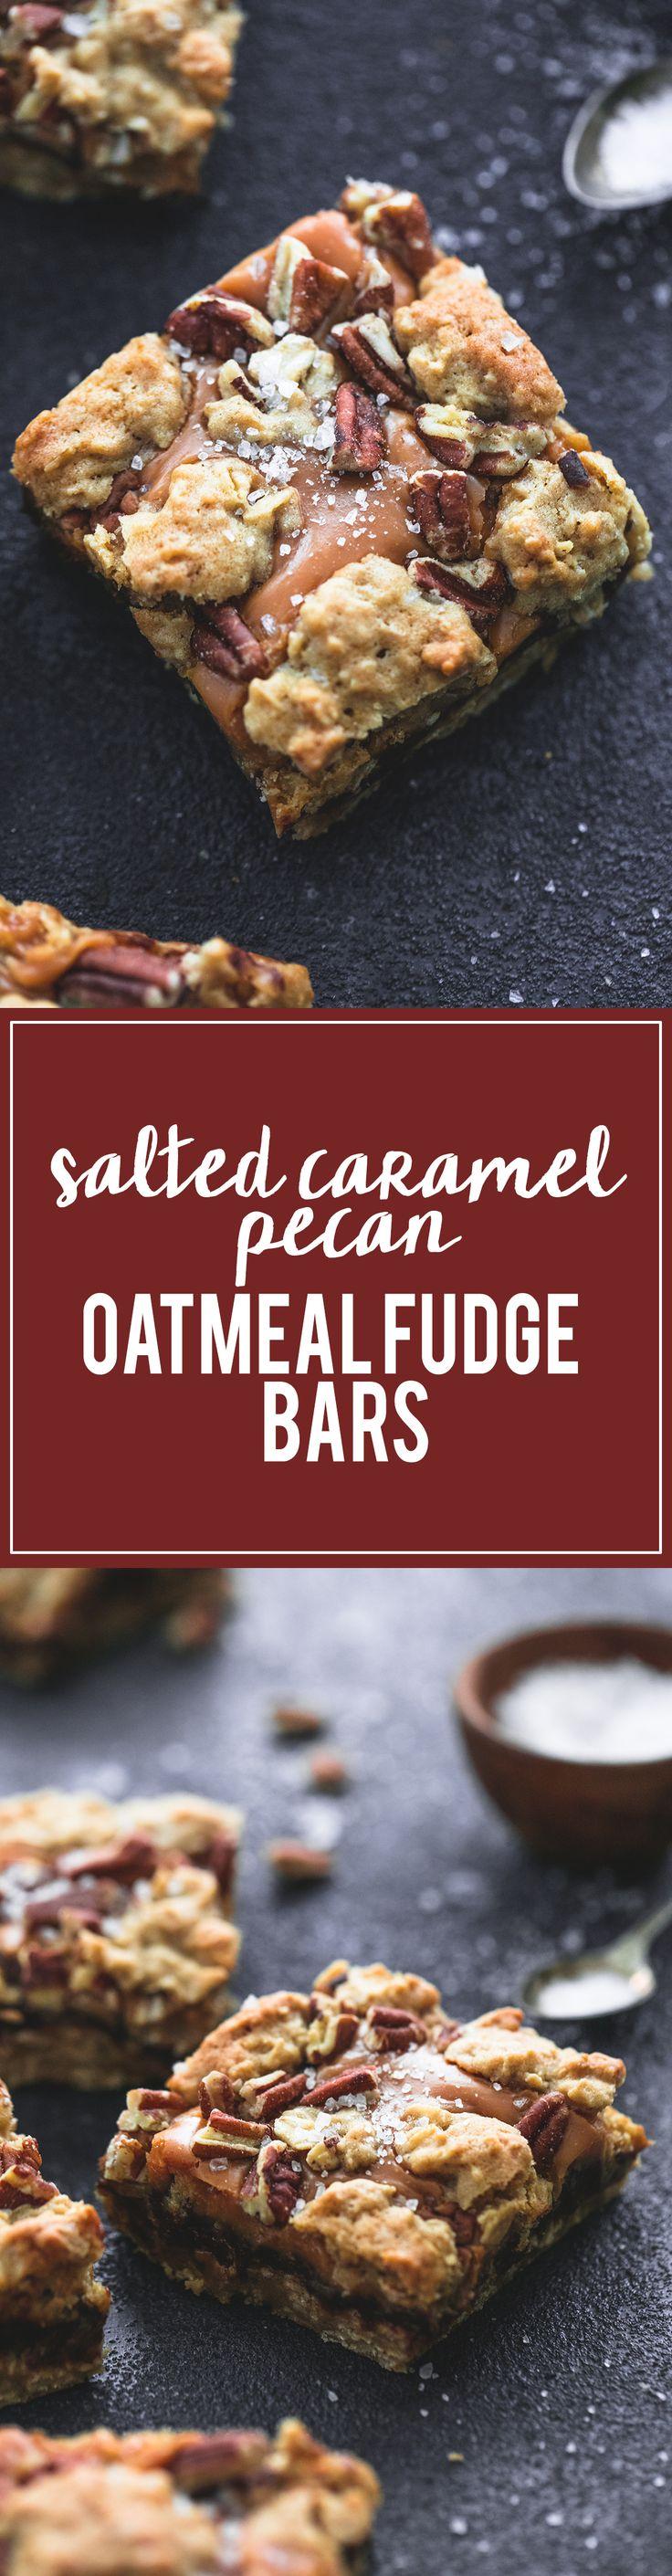 Salted Caramel Pecan Oatmeal Fudge Bars | lecremedelacrumb.com